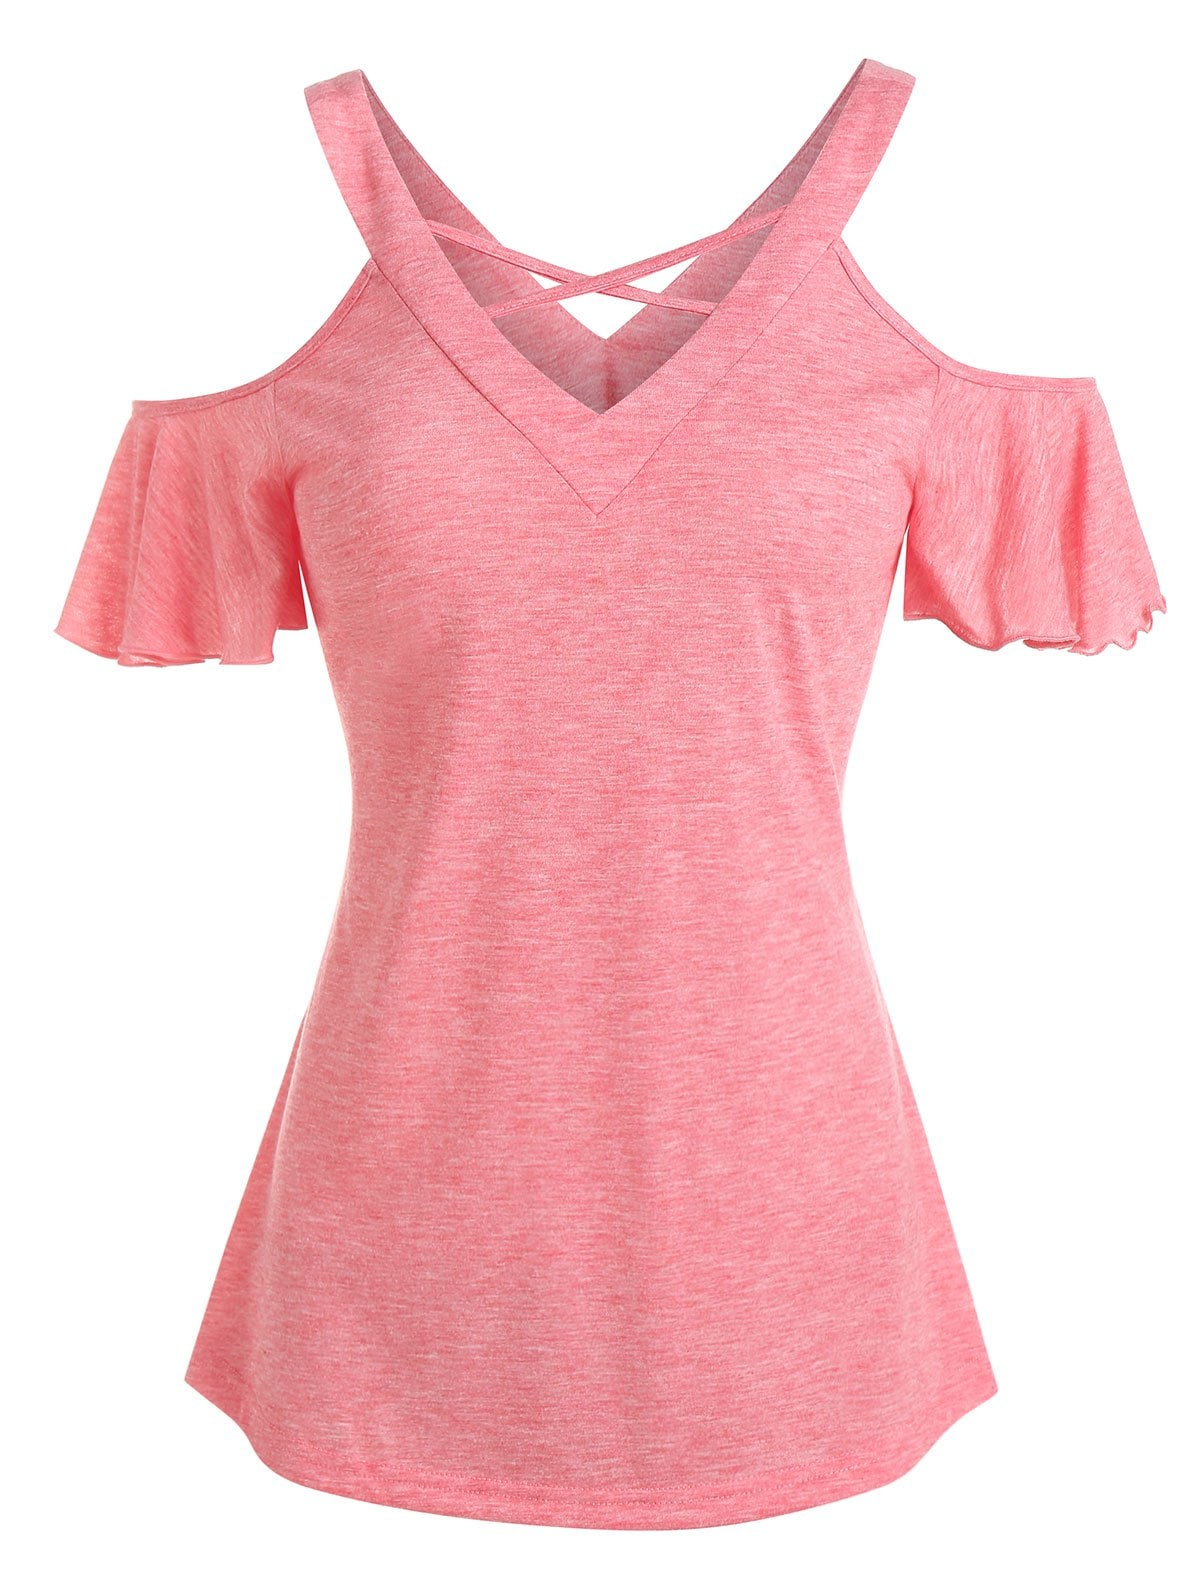 Criss Cross Cold Shoulder Butterfly Sleeve T-Shirt